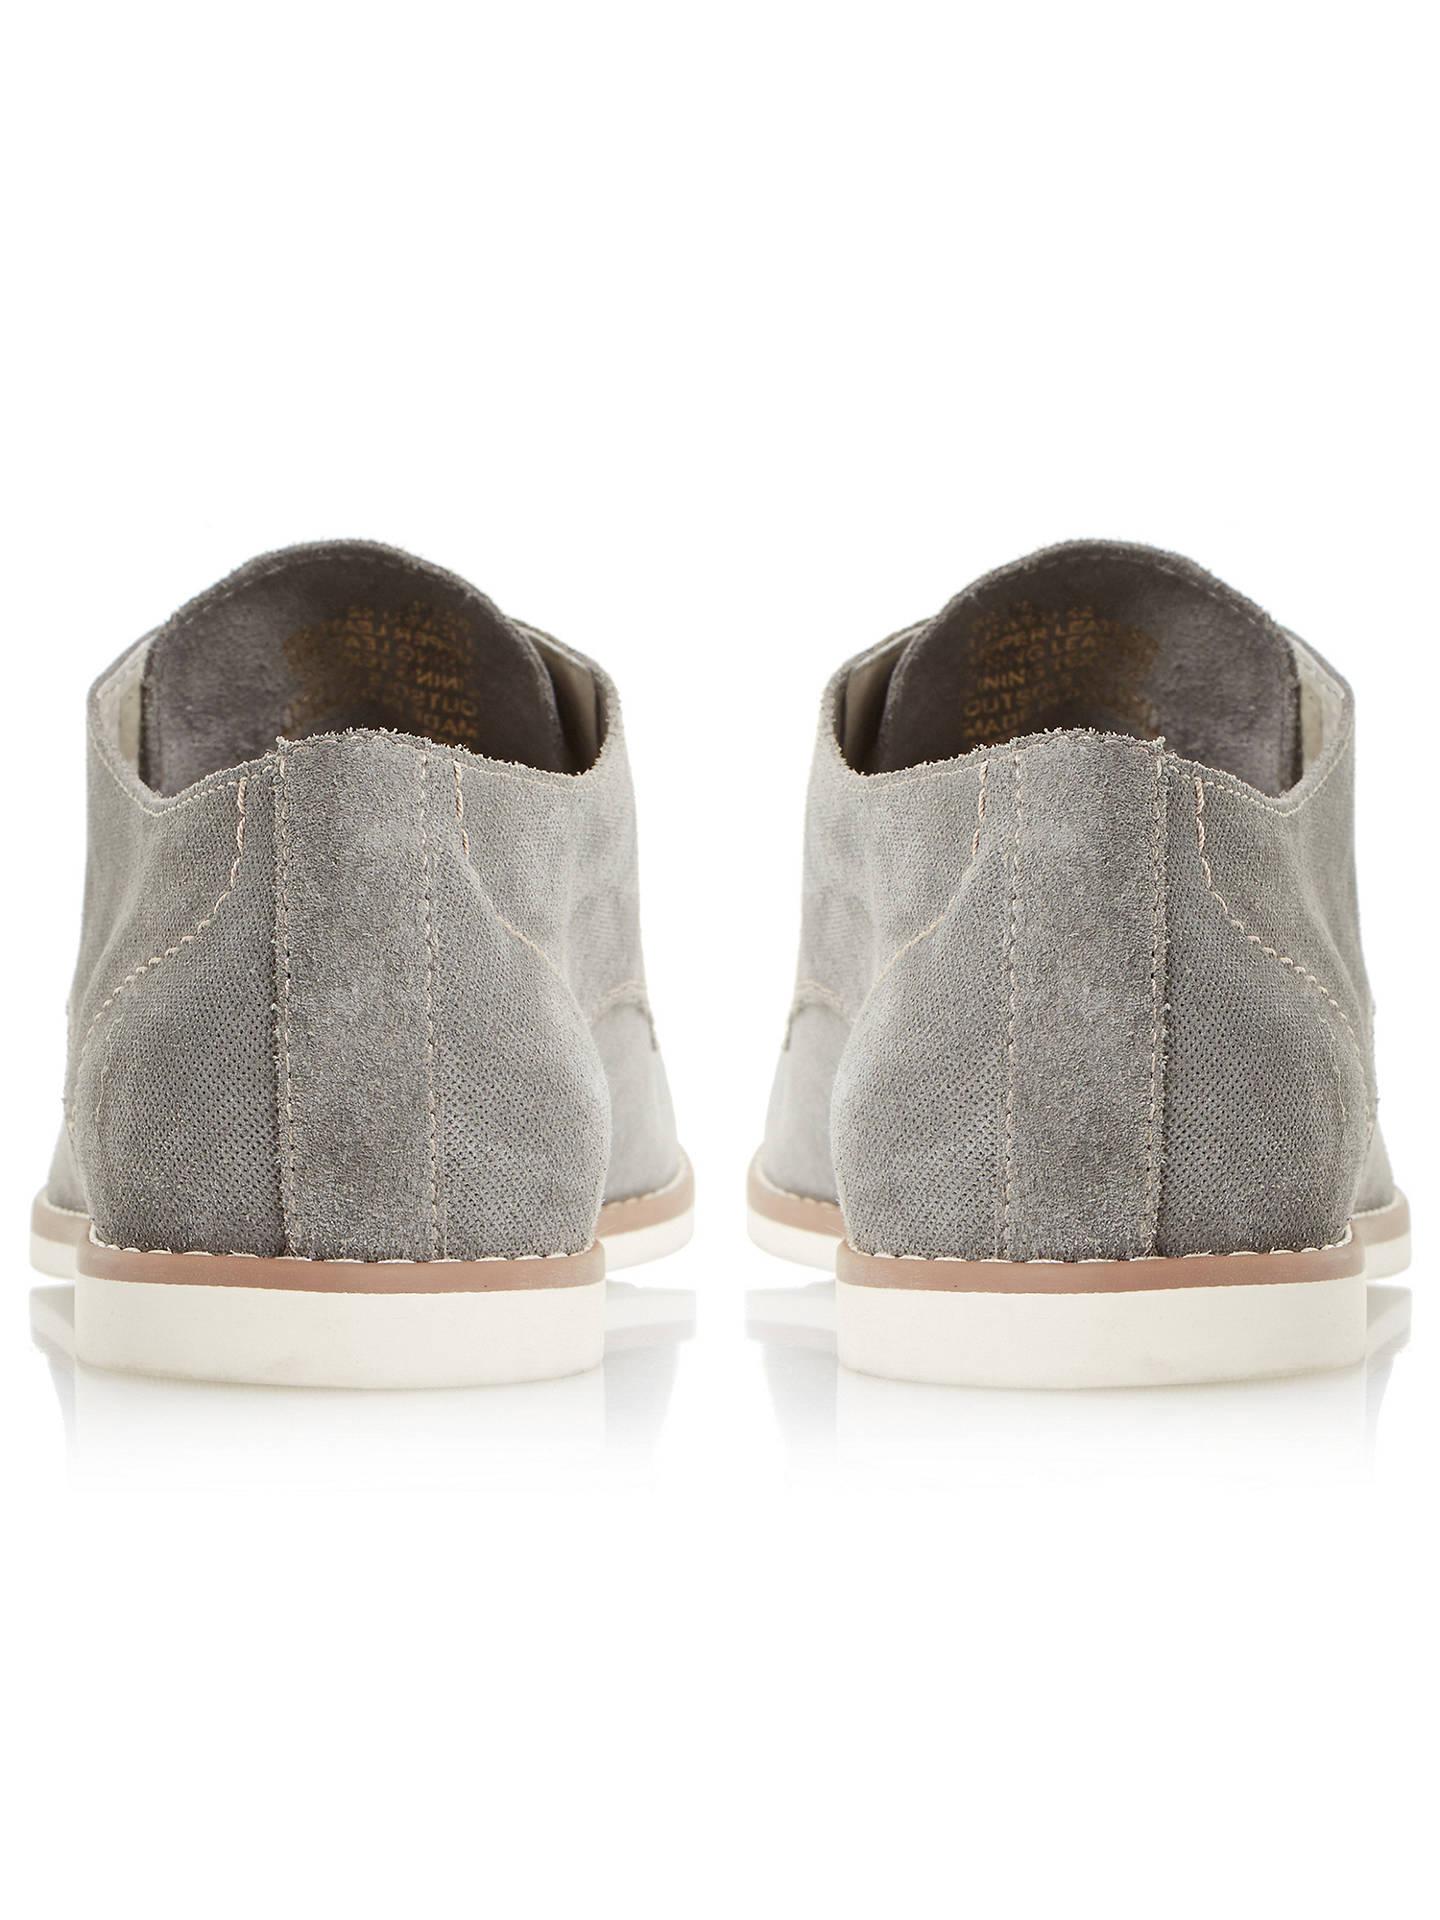 77ac30122531d ... Buy Bertie Basil Suede Derby Shoes, Grey, 6 Online at johnlewis.com ...